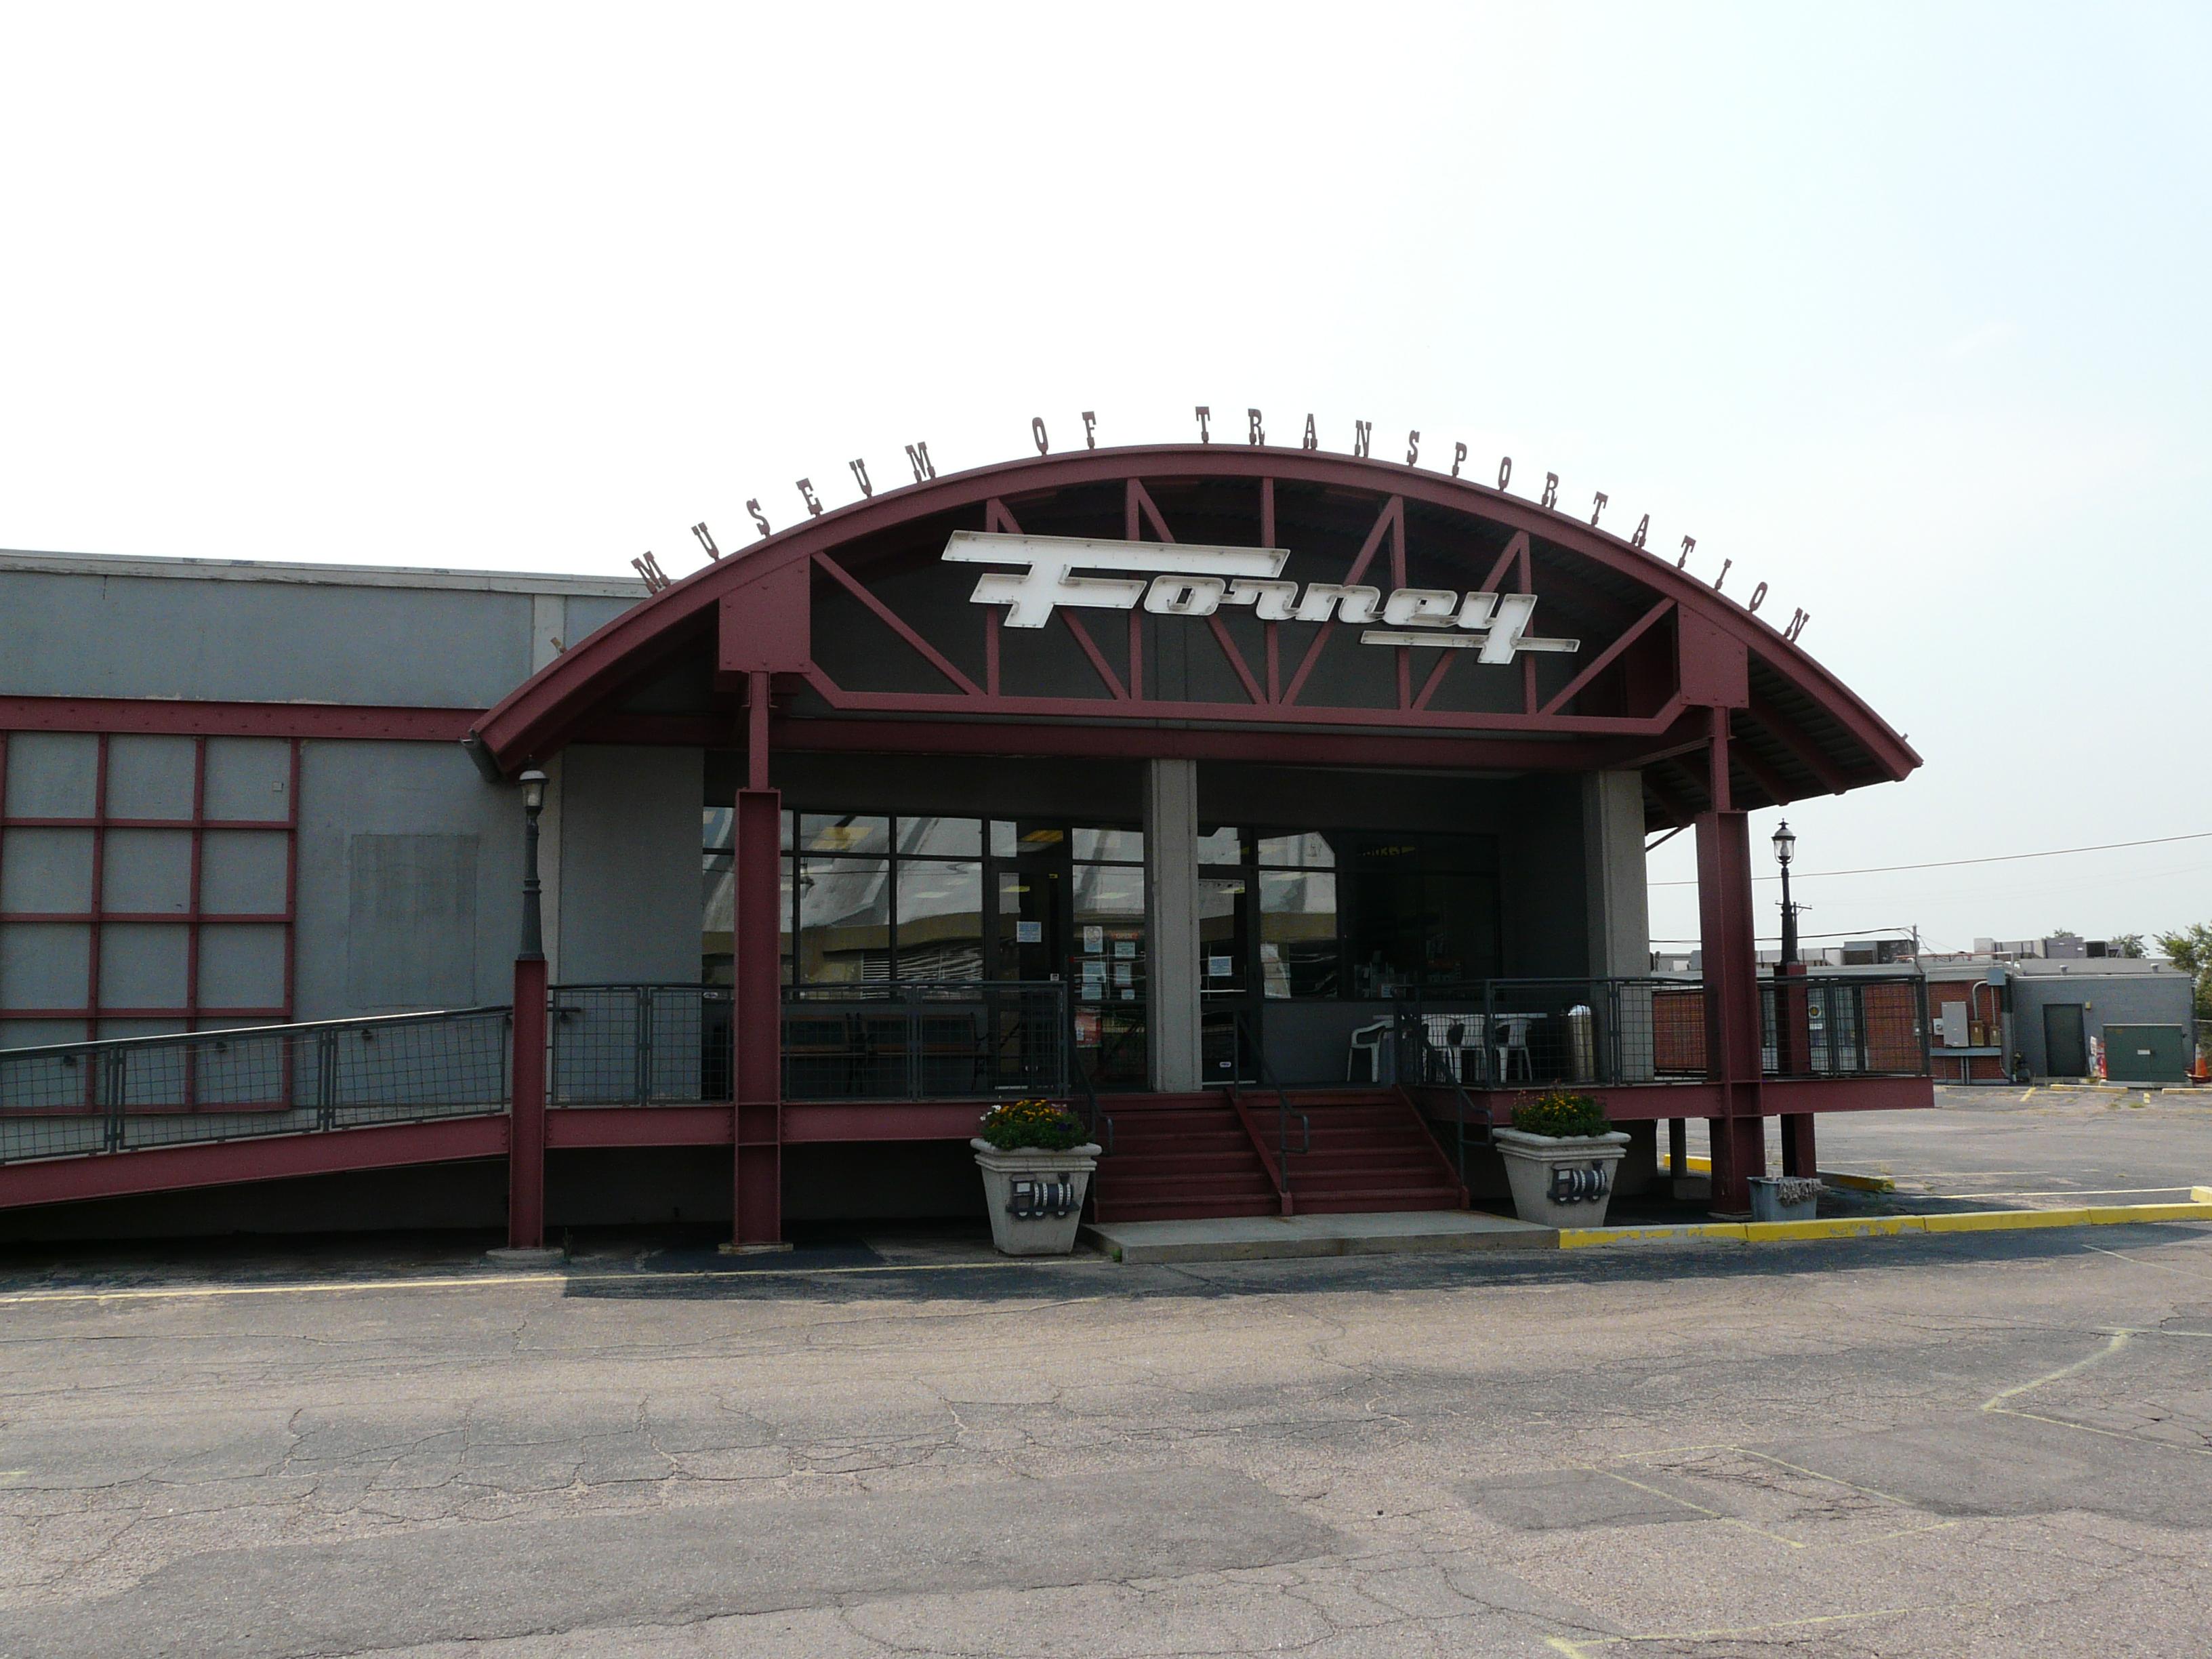 Denver transport museum 002.JPG